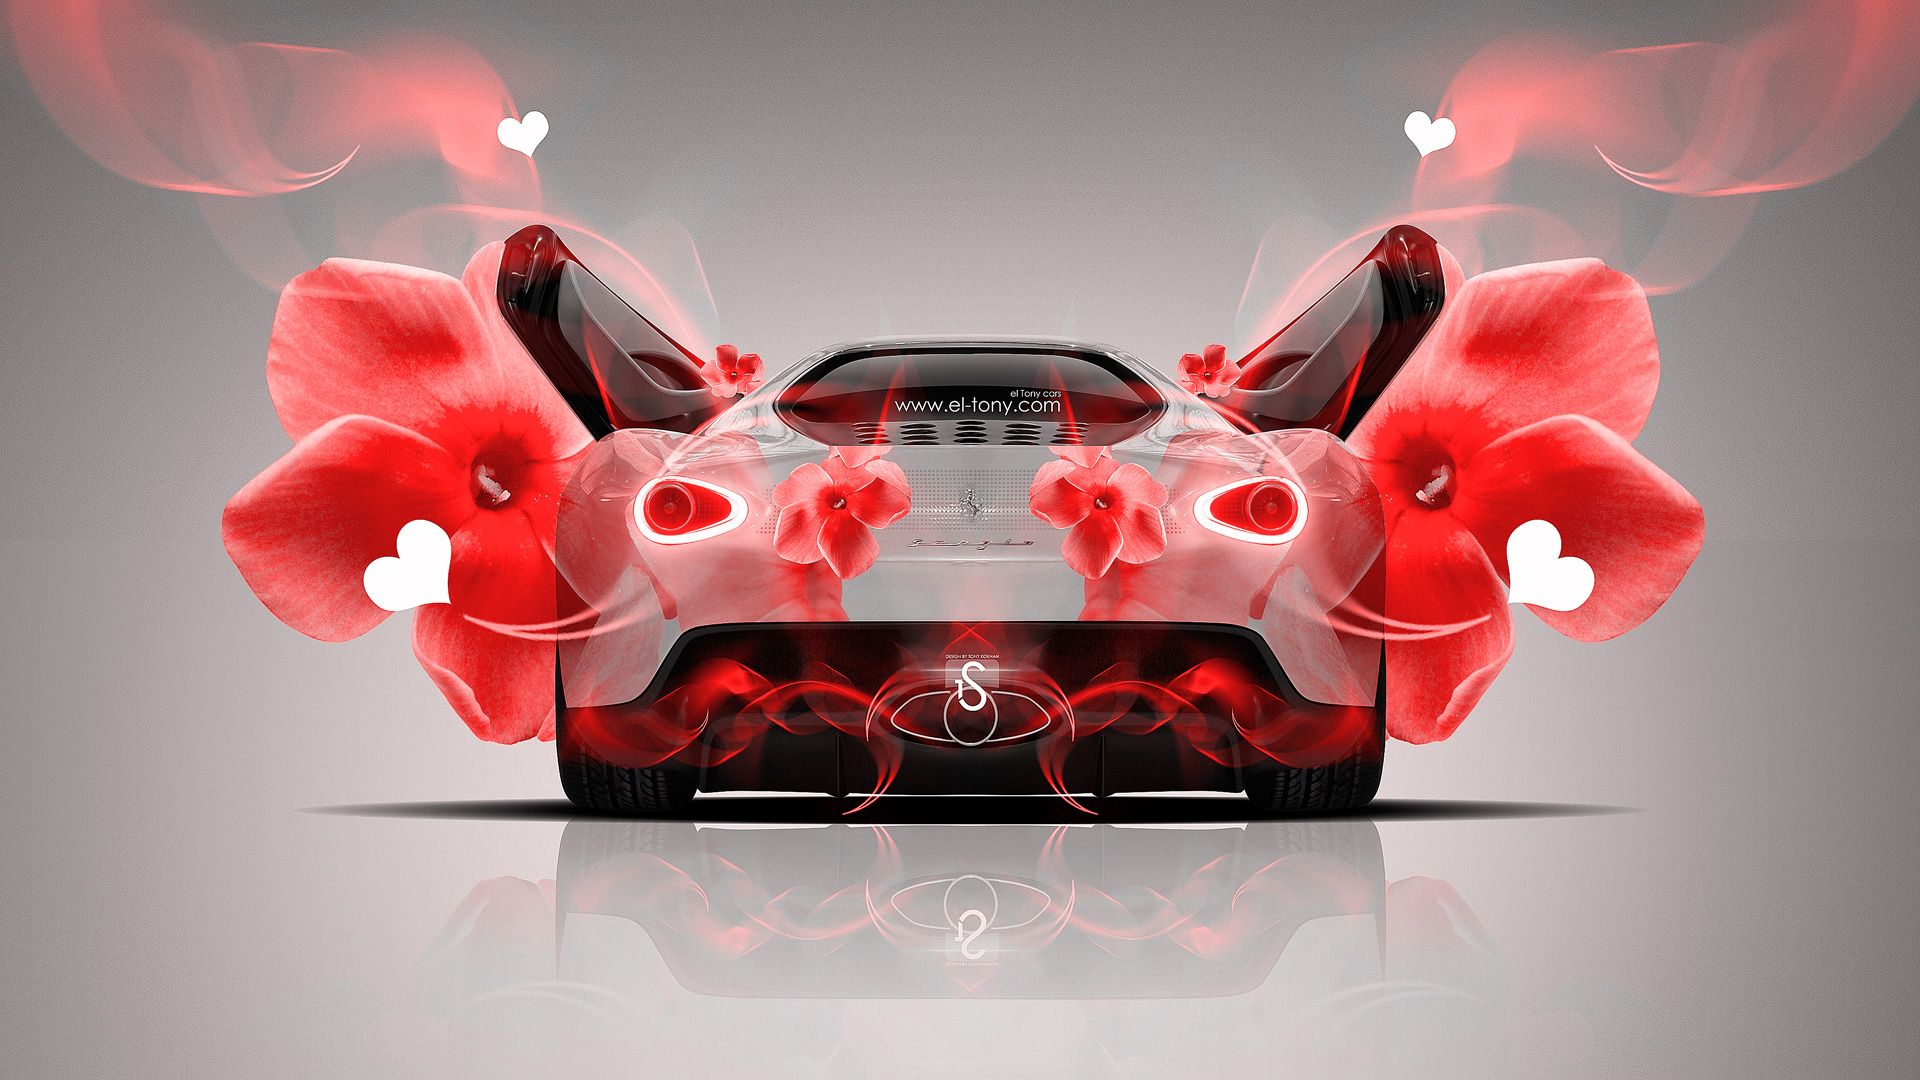 Http://www.el Tony.com/wp Content/uploads/2014/01/Ferrari Sergio Fantasy  Red Heart Flowers Car 2014 HD Wallpapers Design By Tony Kokhan Www.el Tonyu2026